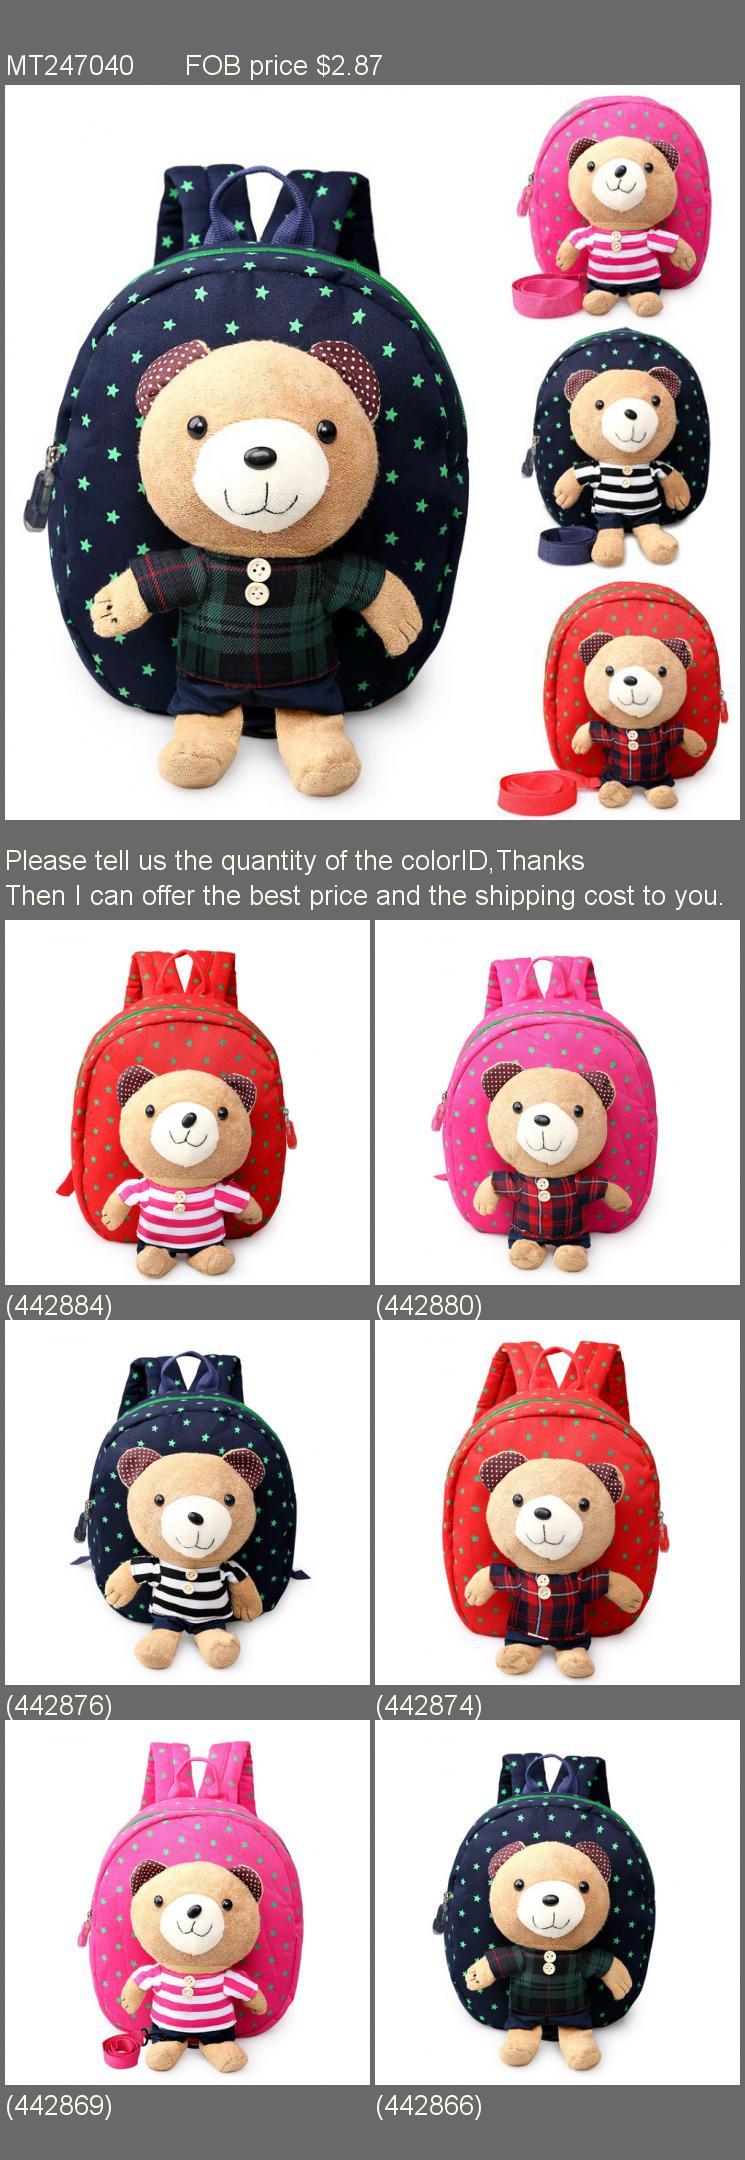 2018 3D Cartoon Plush Children Backpacks kindergarten Schoolbag Animal Kids  Backpack Children School Bags Girls Boys 46313f70a6e75